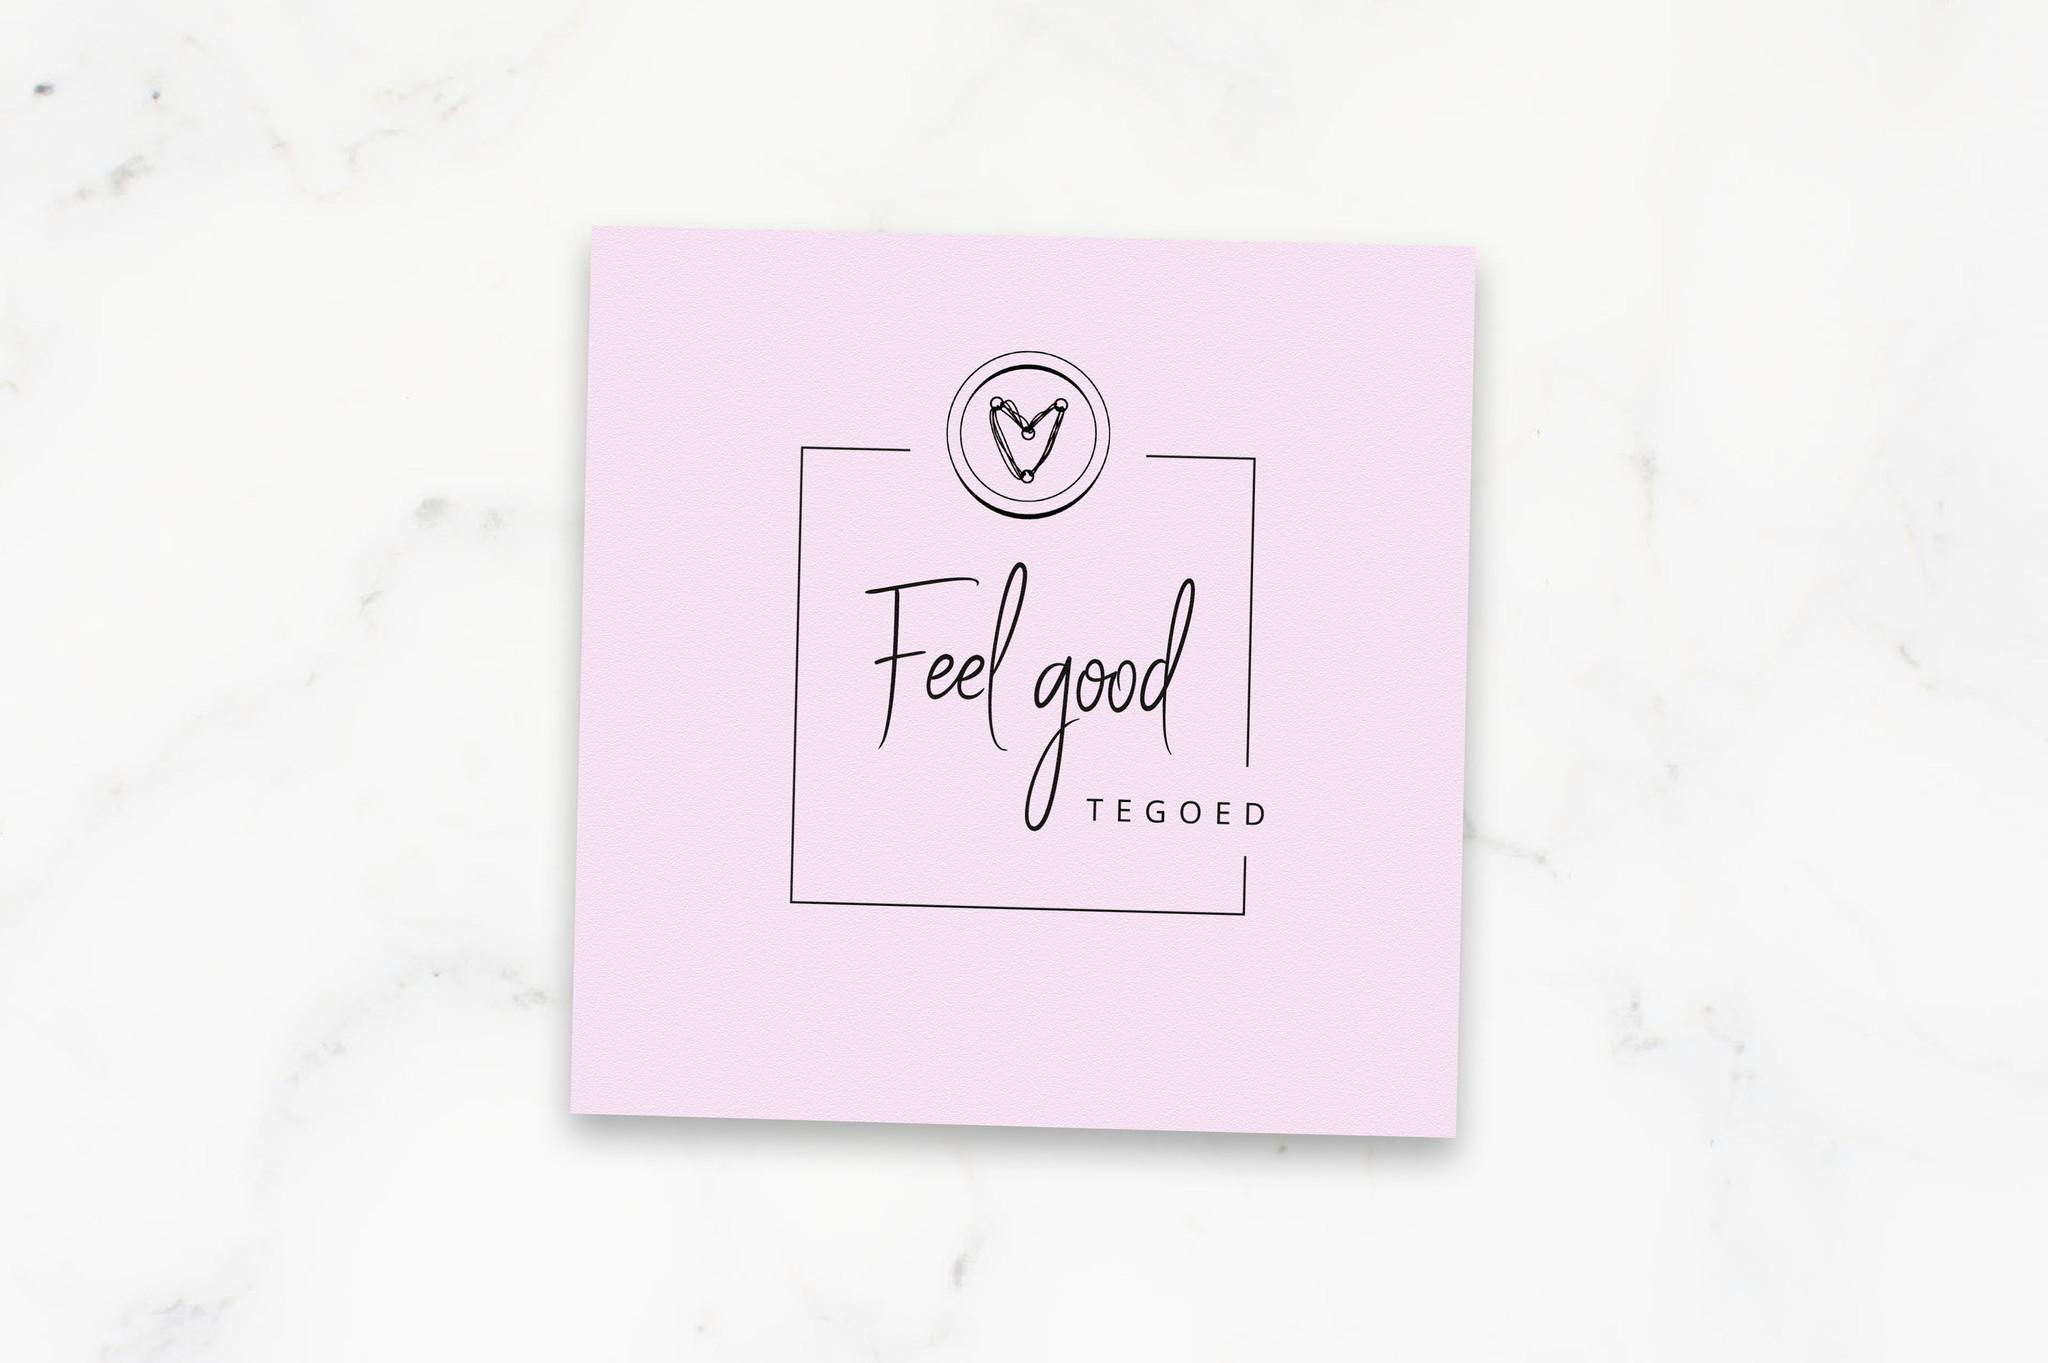 Feel Good Tegoed 'in je mailbox' 40 euro